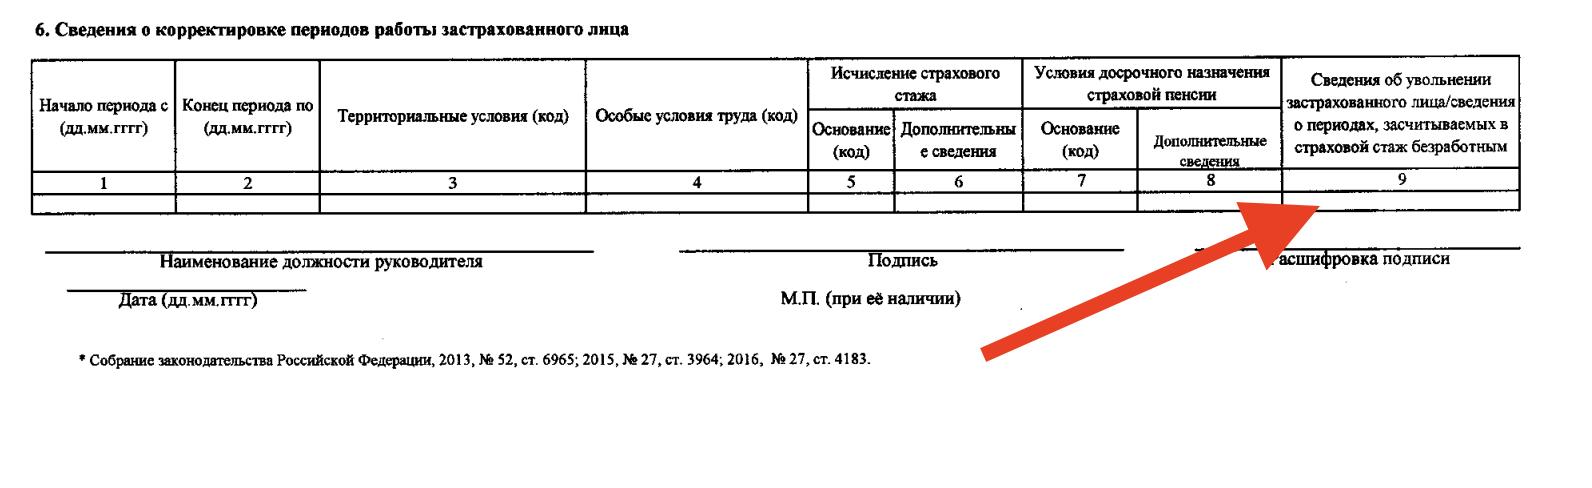 Новая форма СЗВ-КОРР с 2019 года — investim.info